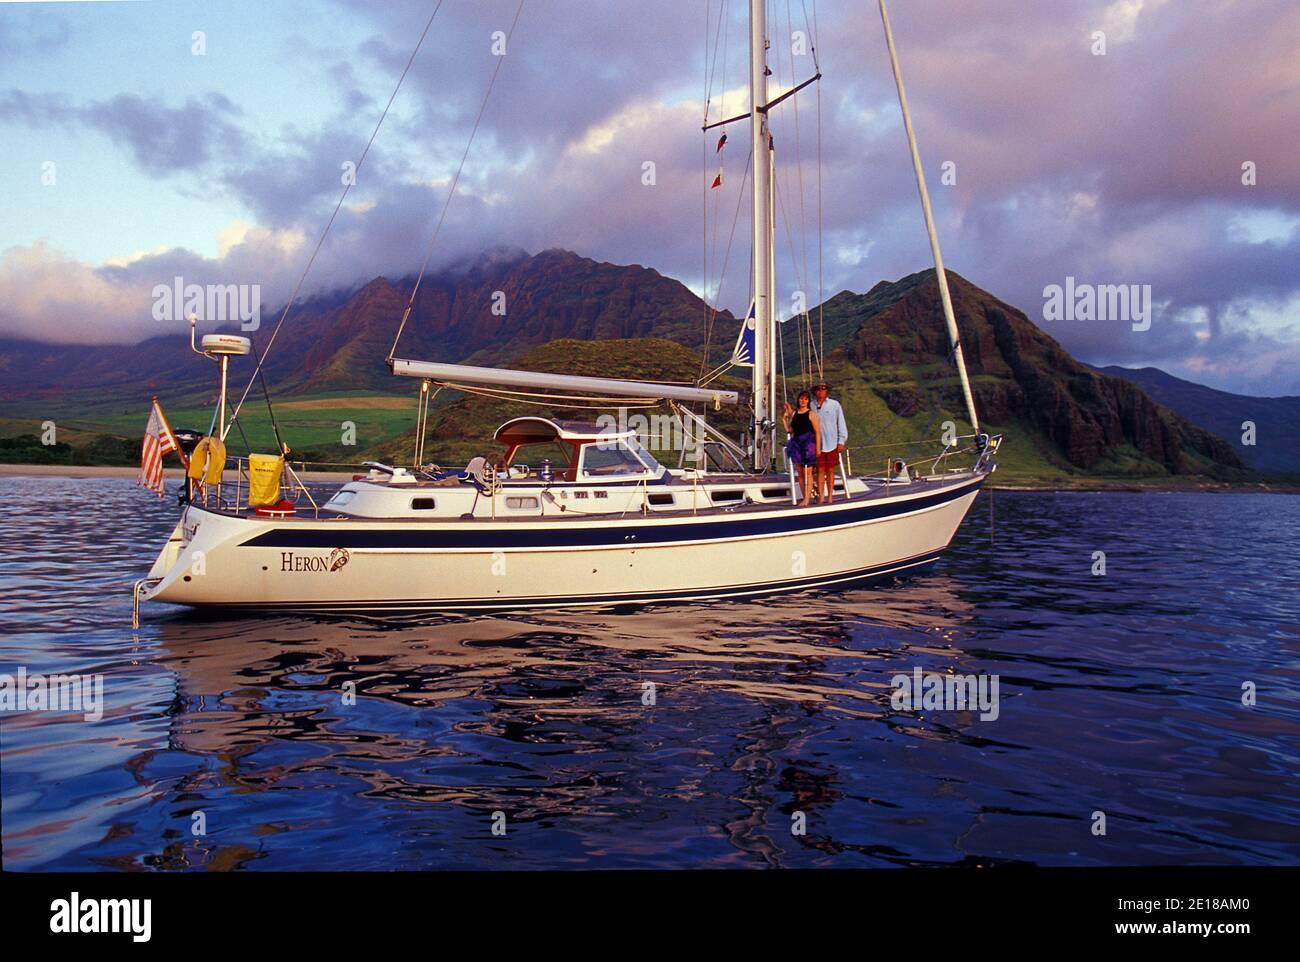 Couple on deck of their 48 foot sailboat off Makua Beach, West Oahu, Hawaii Foto de stock